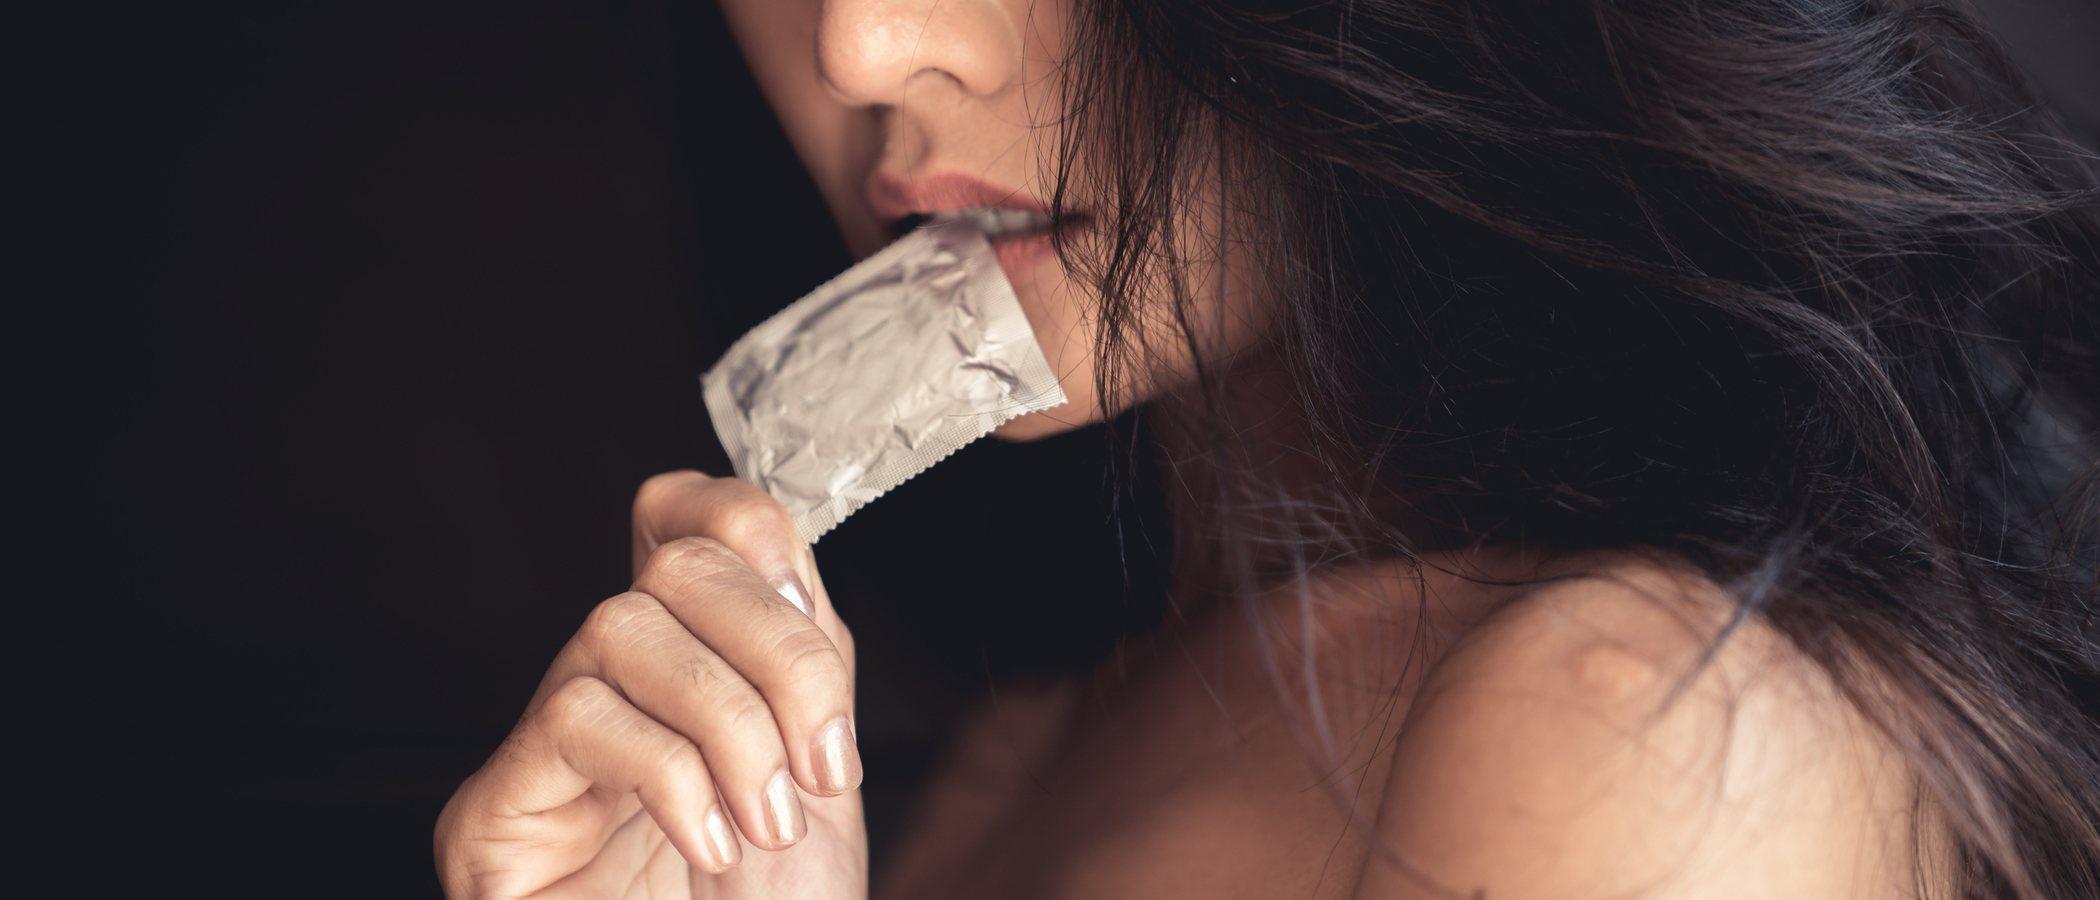 Horóscopo sexual julio 2019: Virgo